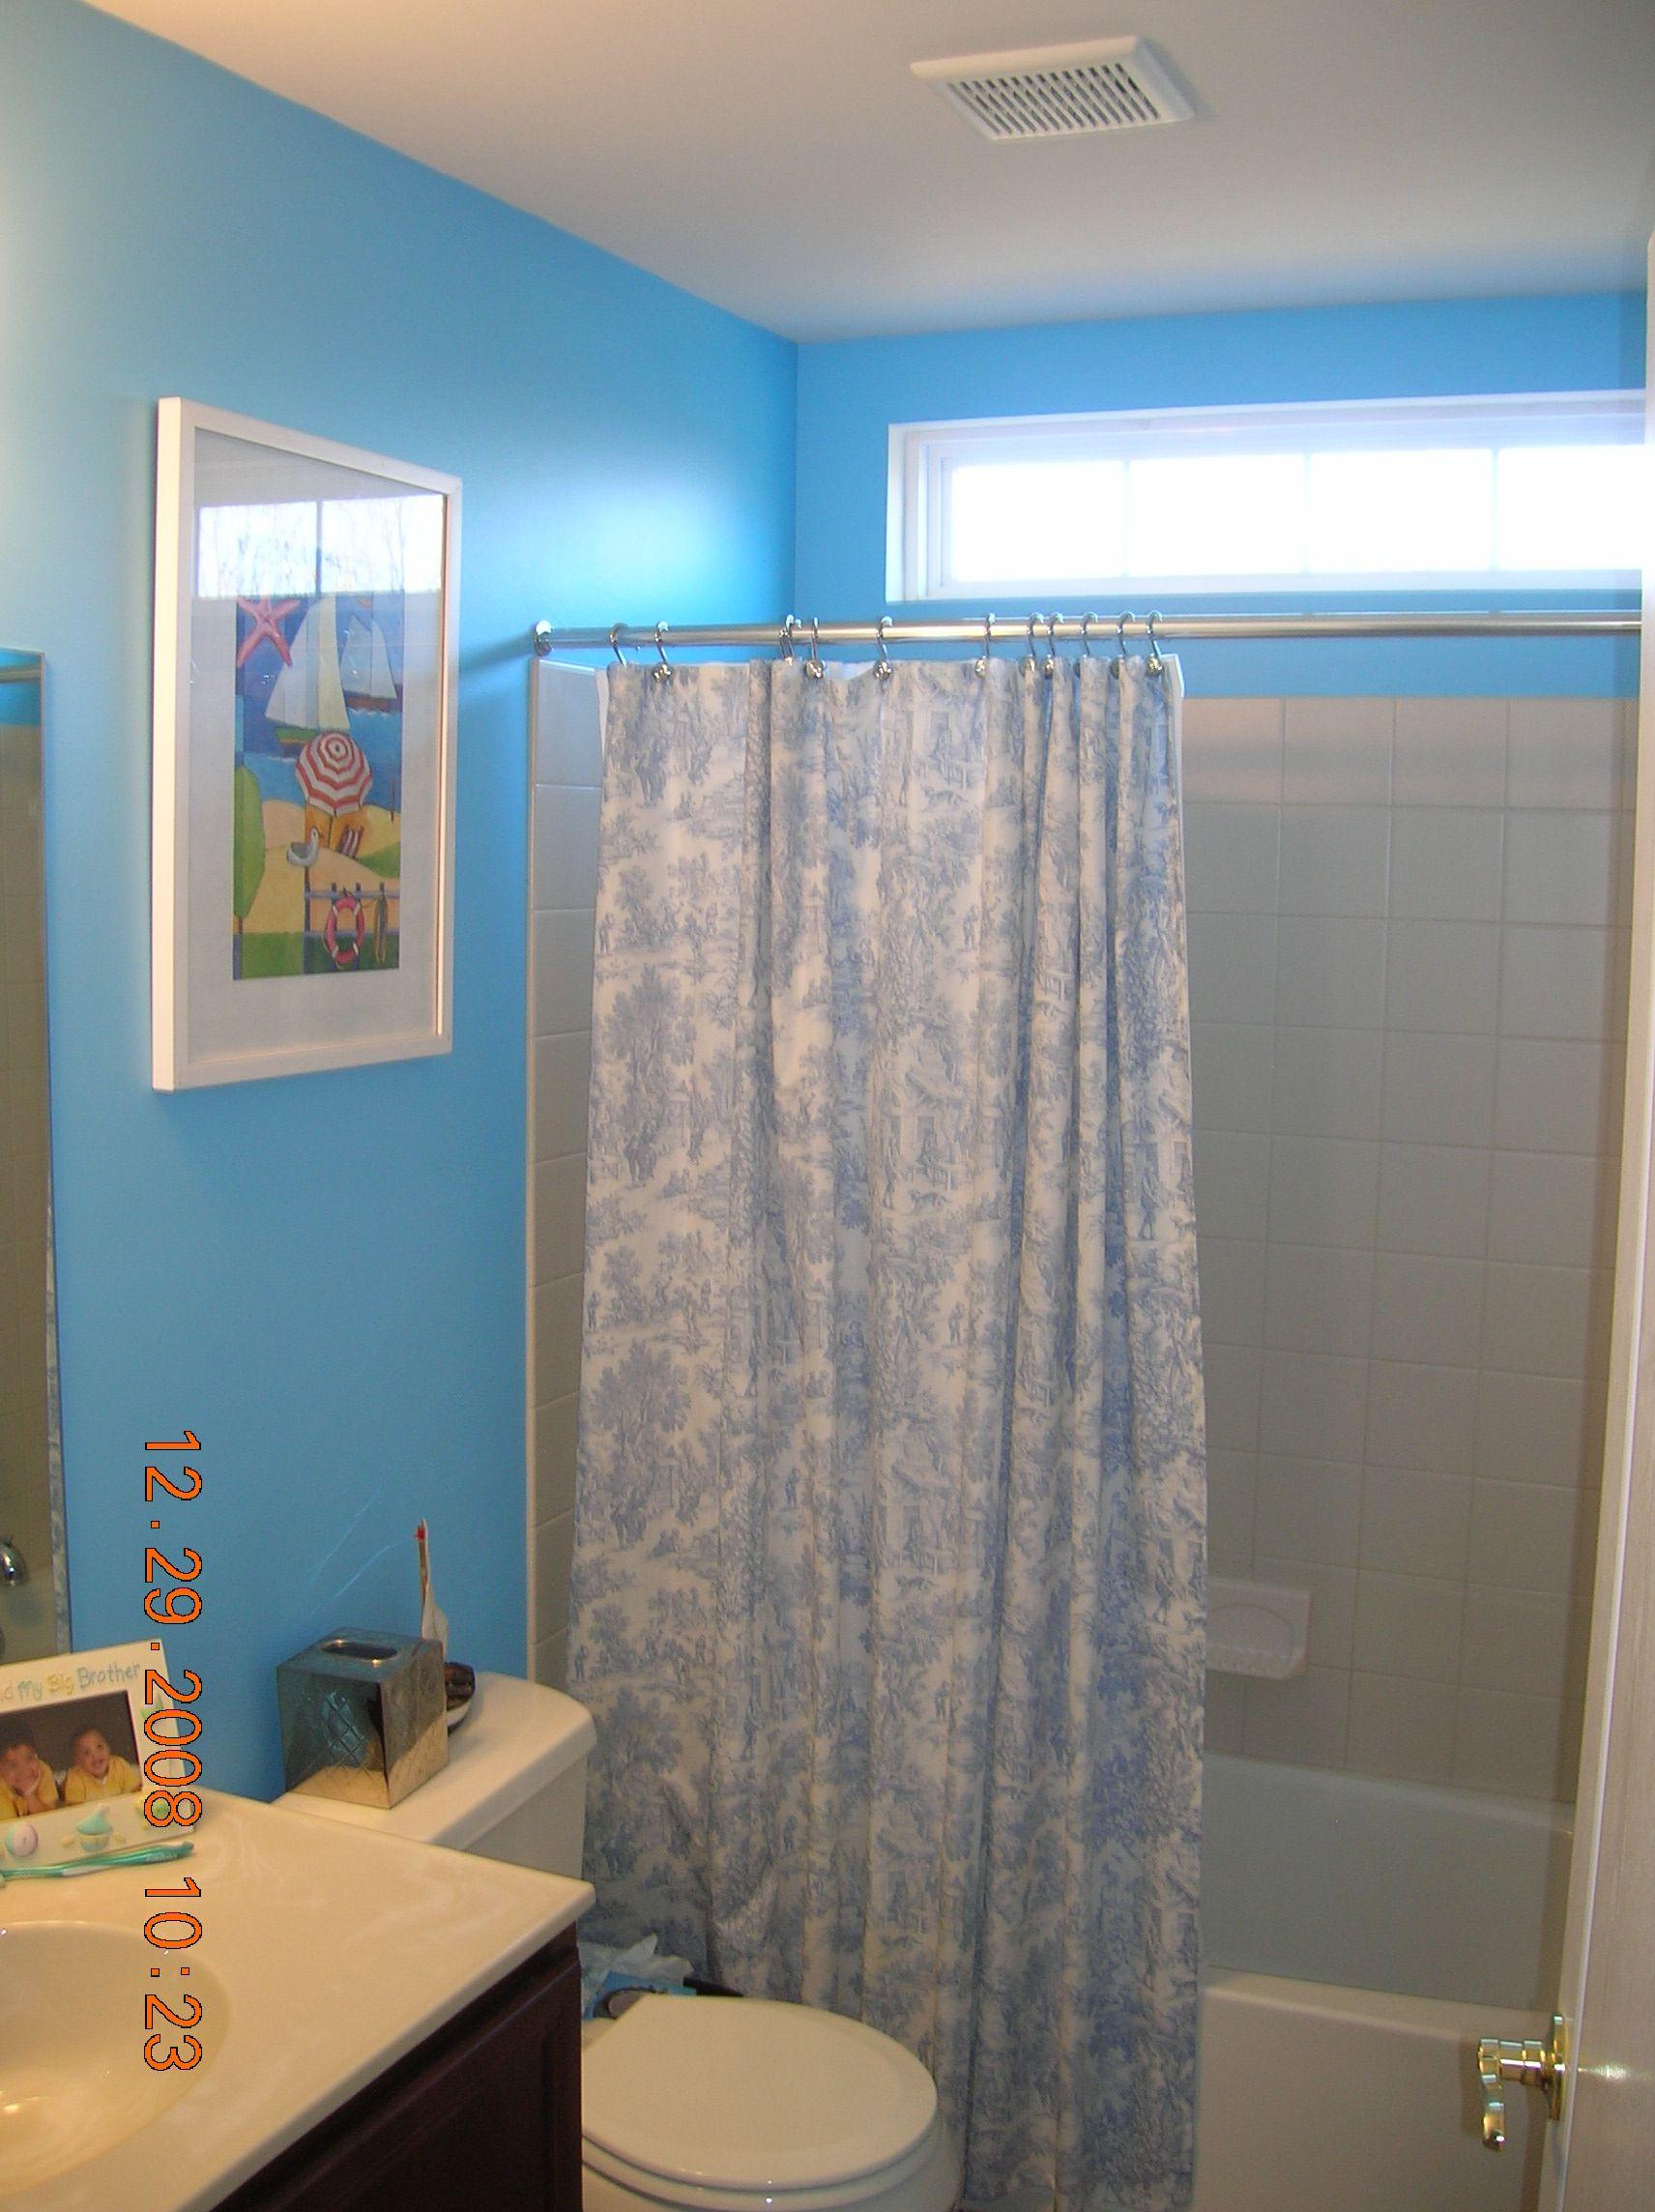 SW Undercool | Paint Color Finalists | Pinterest | Drywall ...